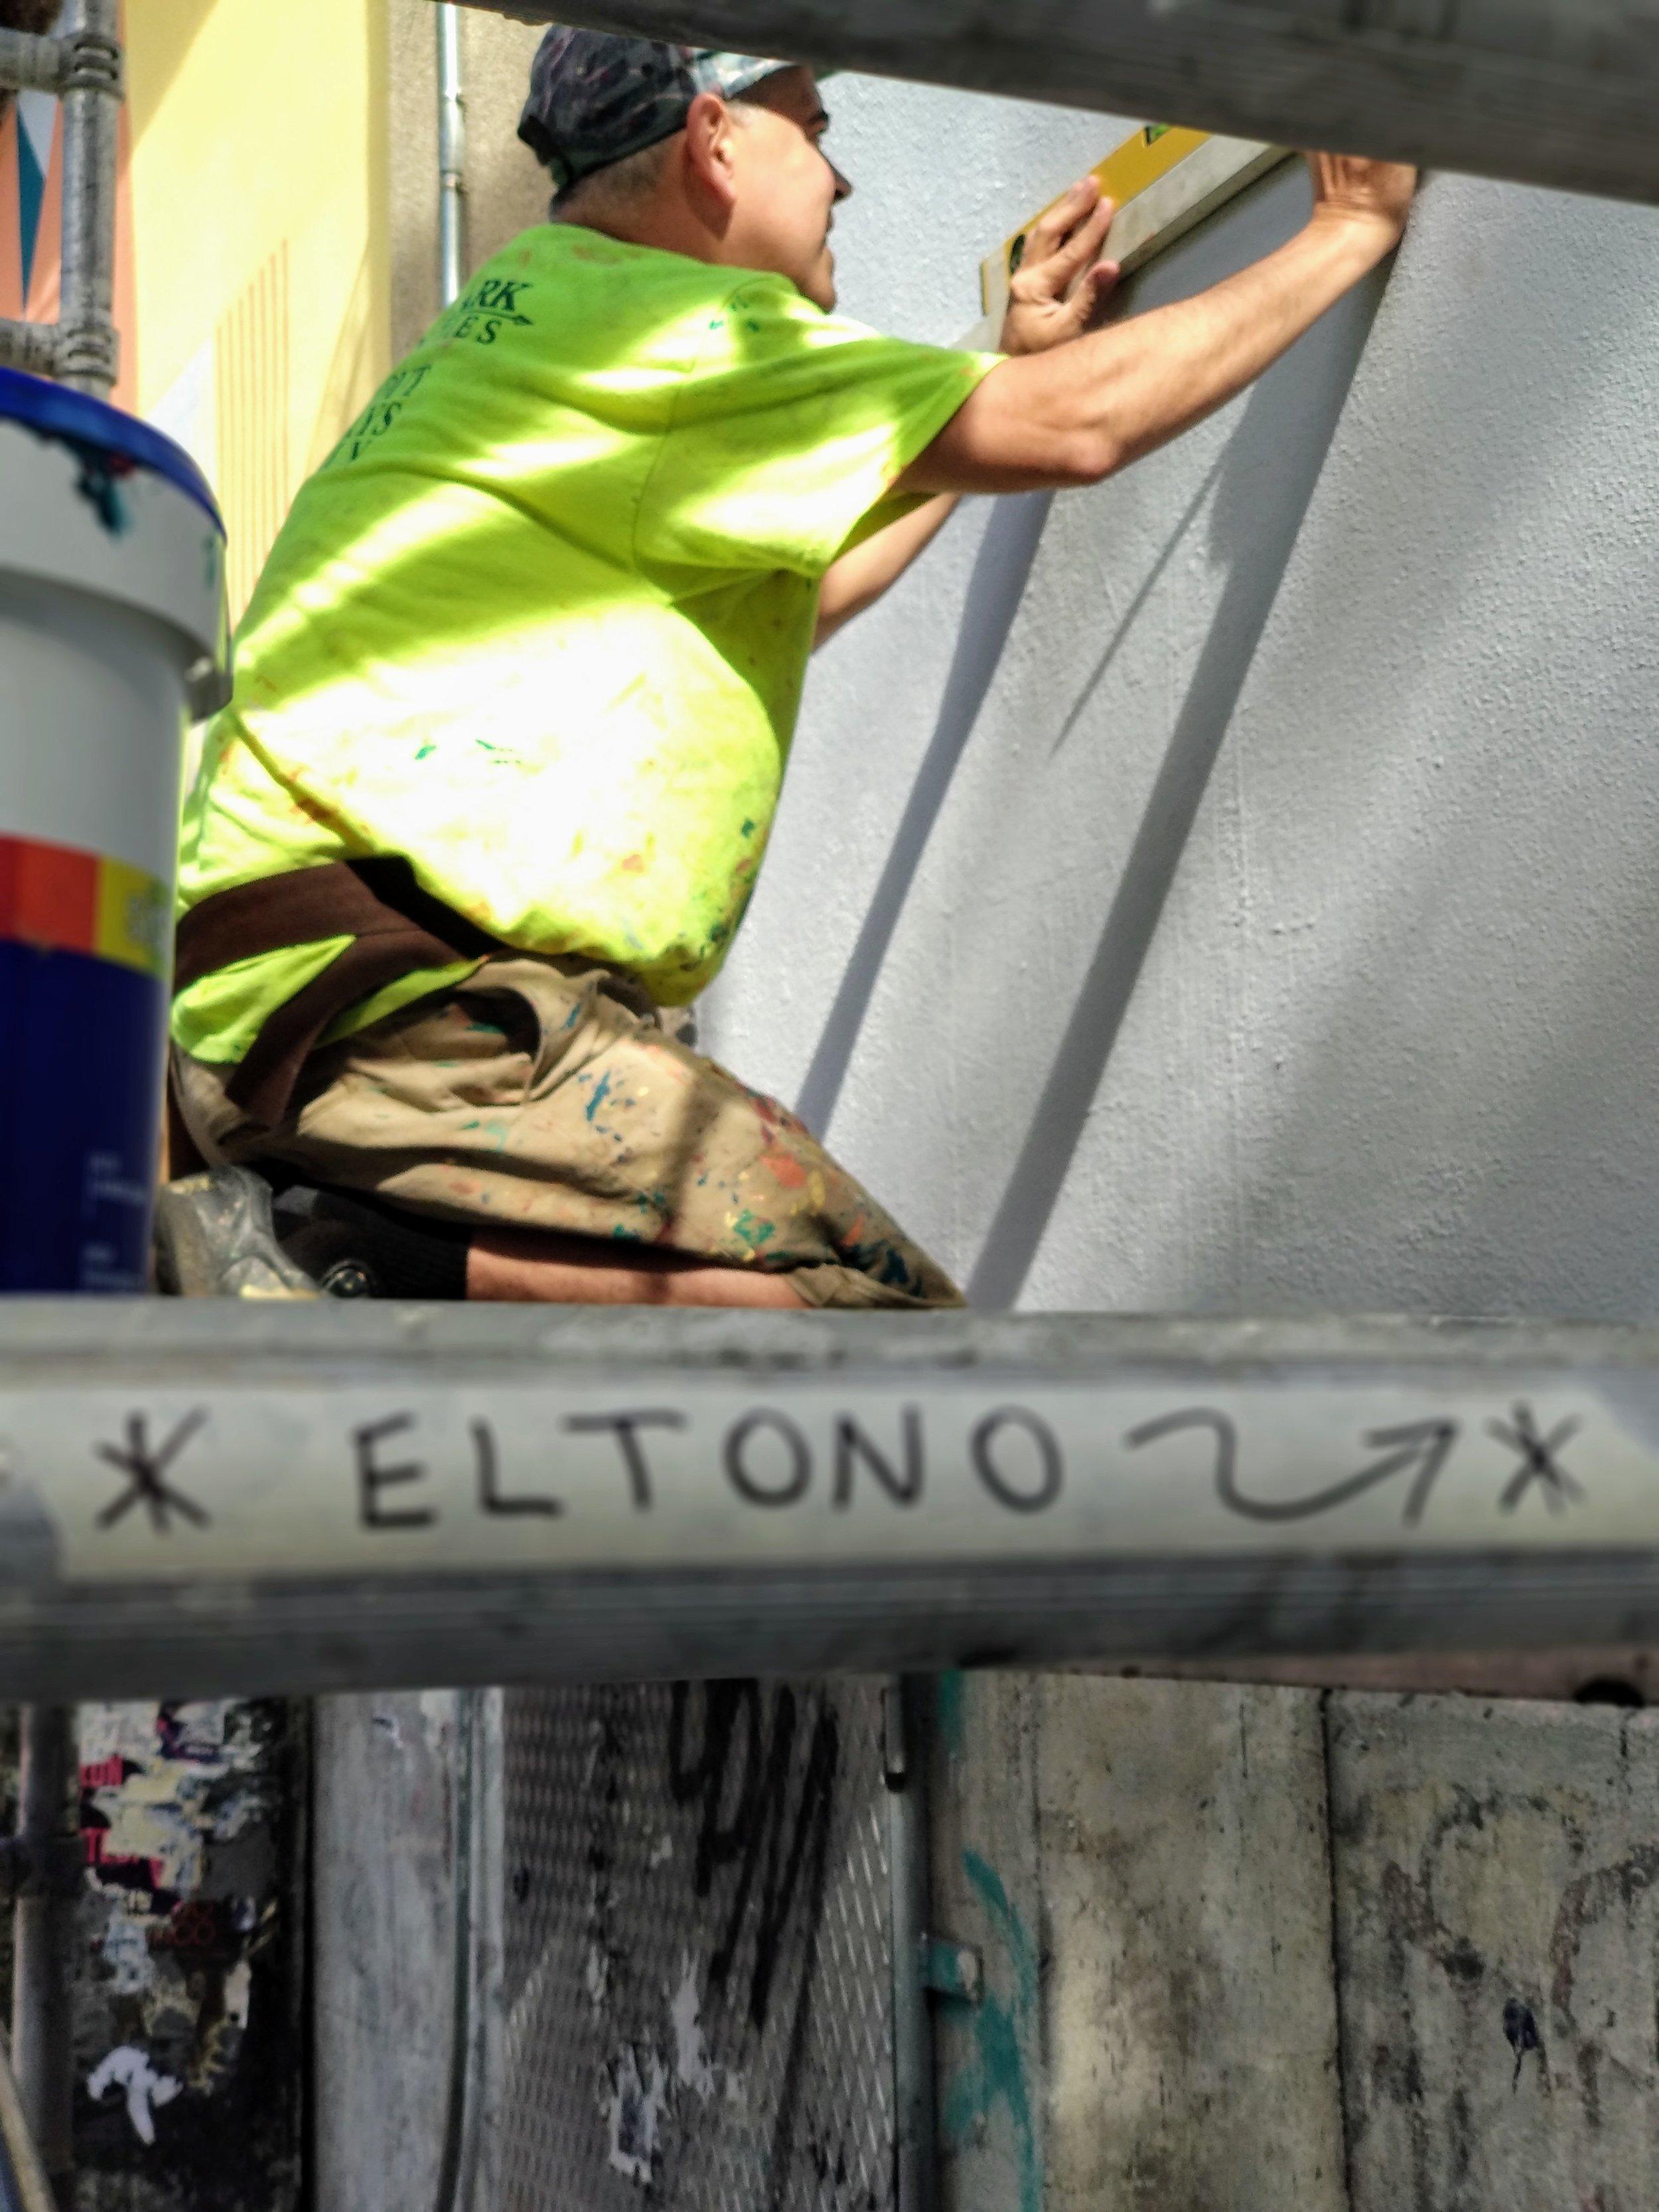 Eltono - Muros Tabacalera 2019 9.jpg